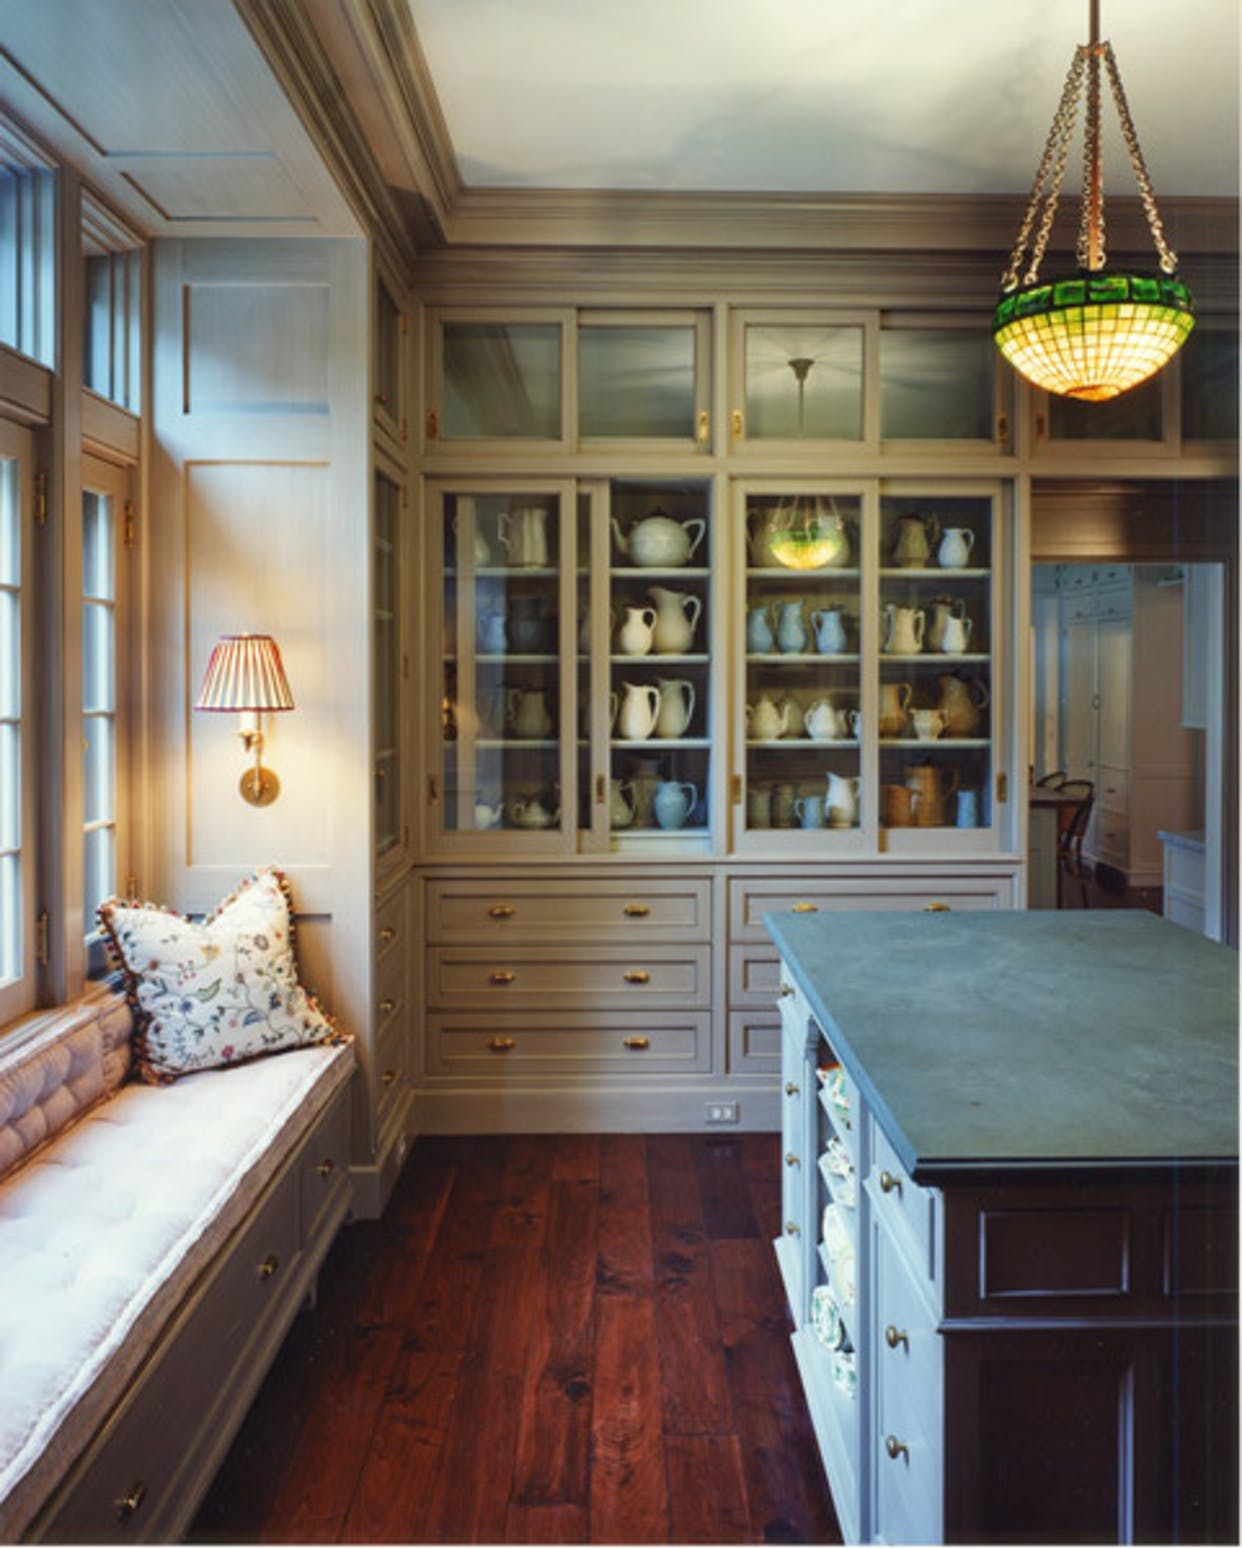 the 2019 a list 100 of elle decor s favorite interior designers home window seat kitchen on kitchen interior with window id=16876